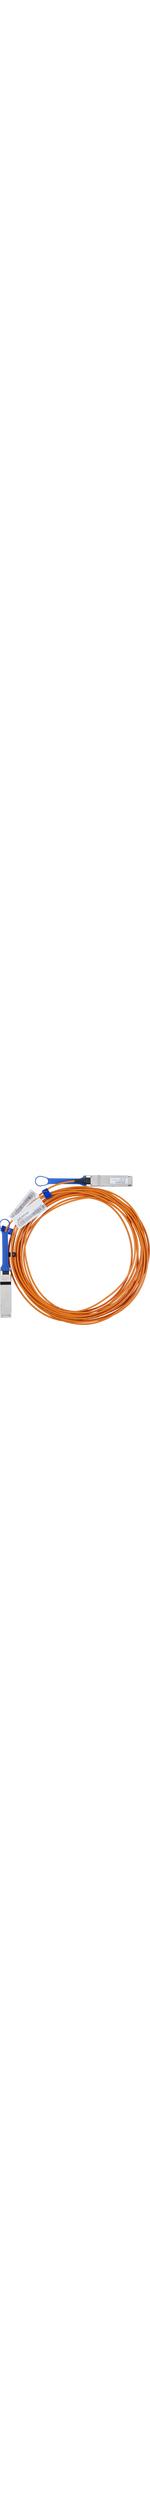 Mellanox Fibre Optic Network Cable for Network Device - 3.05 m - 1 x QSFP Male Network - 1 x QSFP Male Network